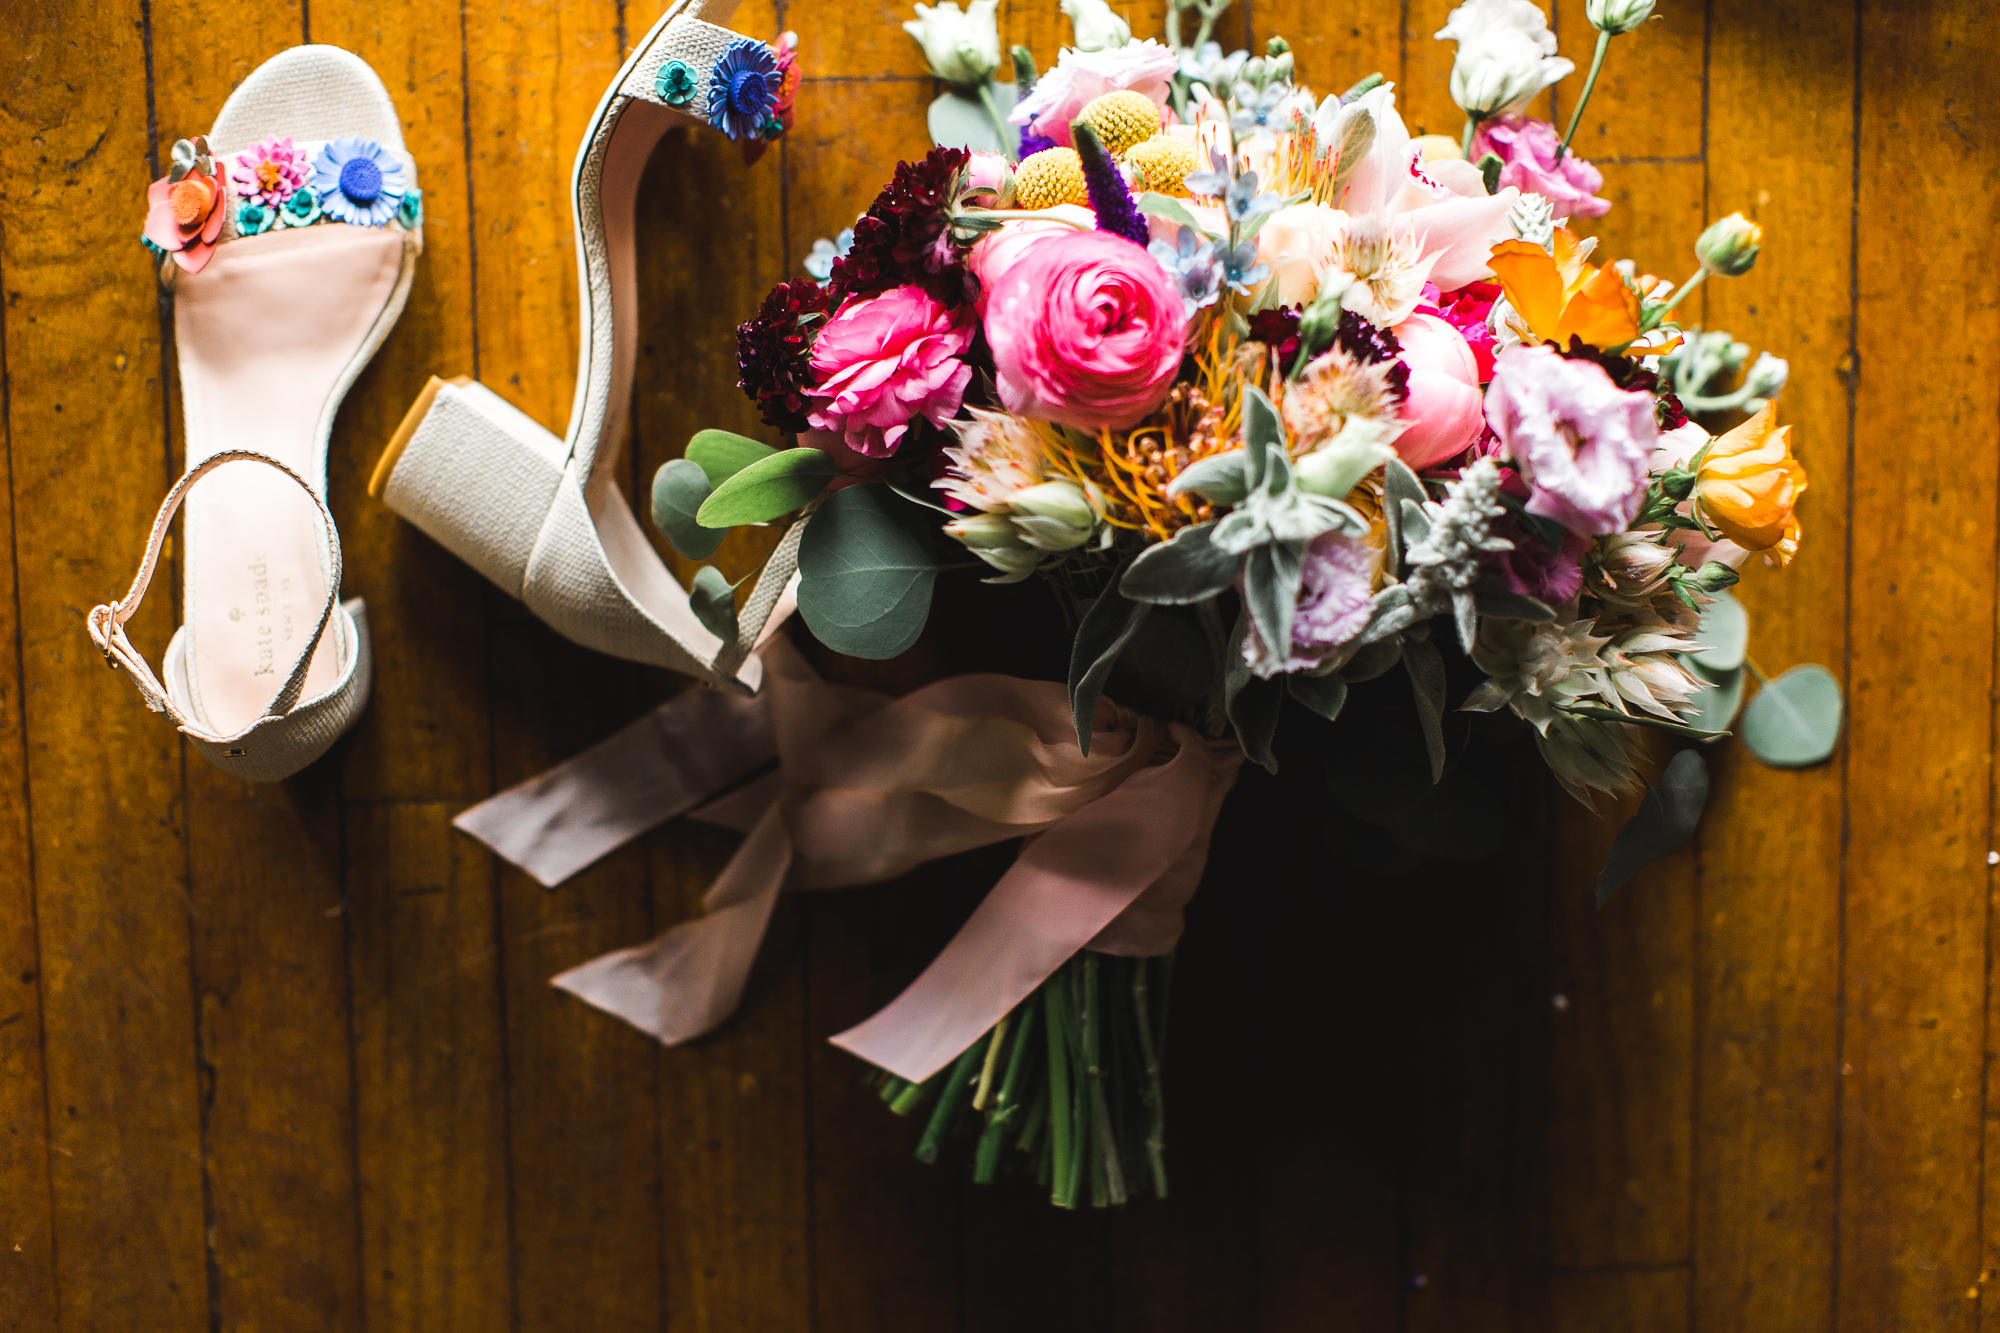 Colorful-Liberty-Warehouse-Brooklyn-Wedding-Emily-Kirke (7 of 100).jpg